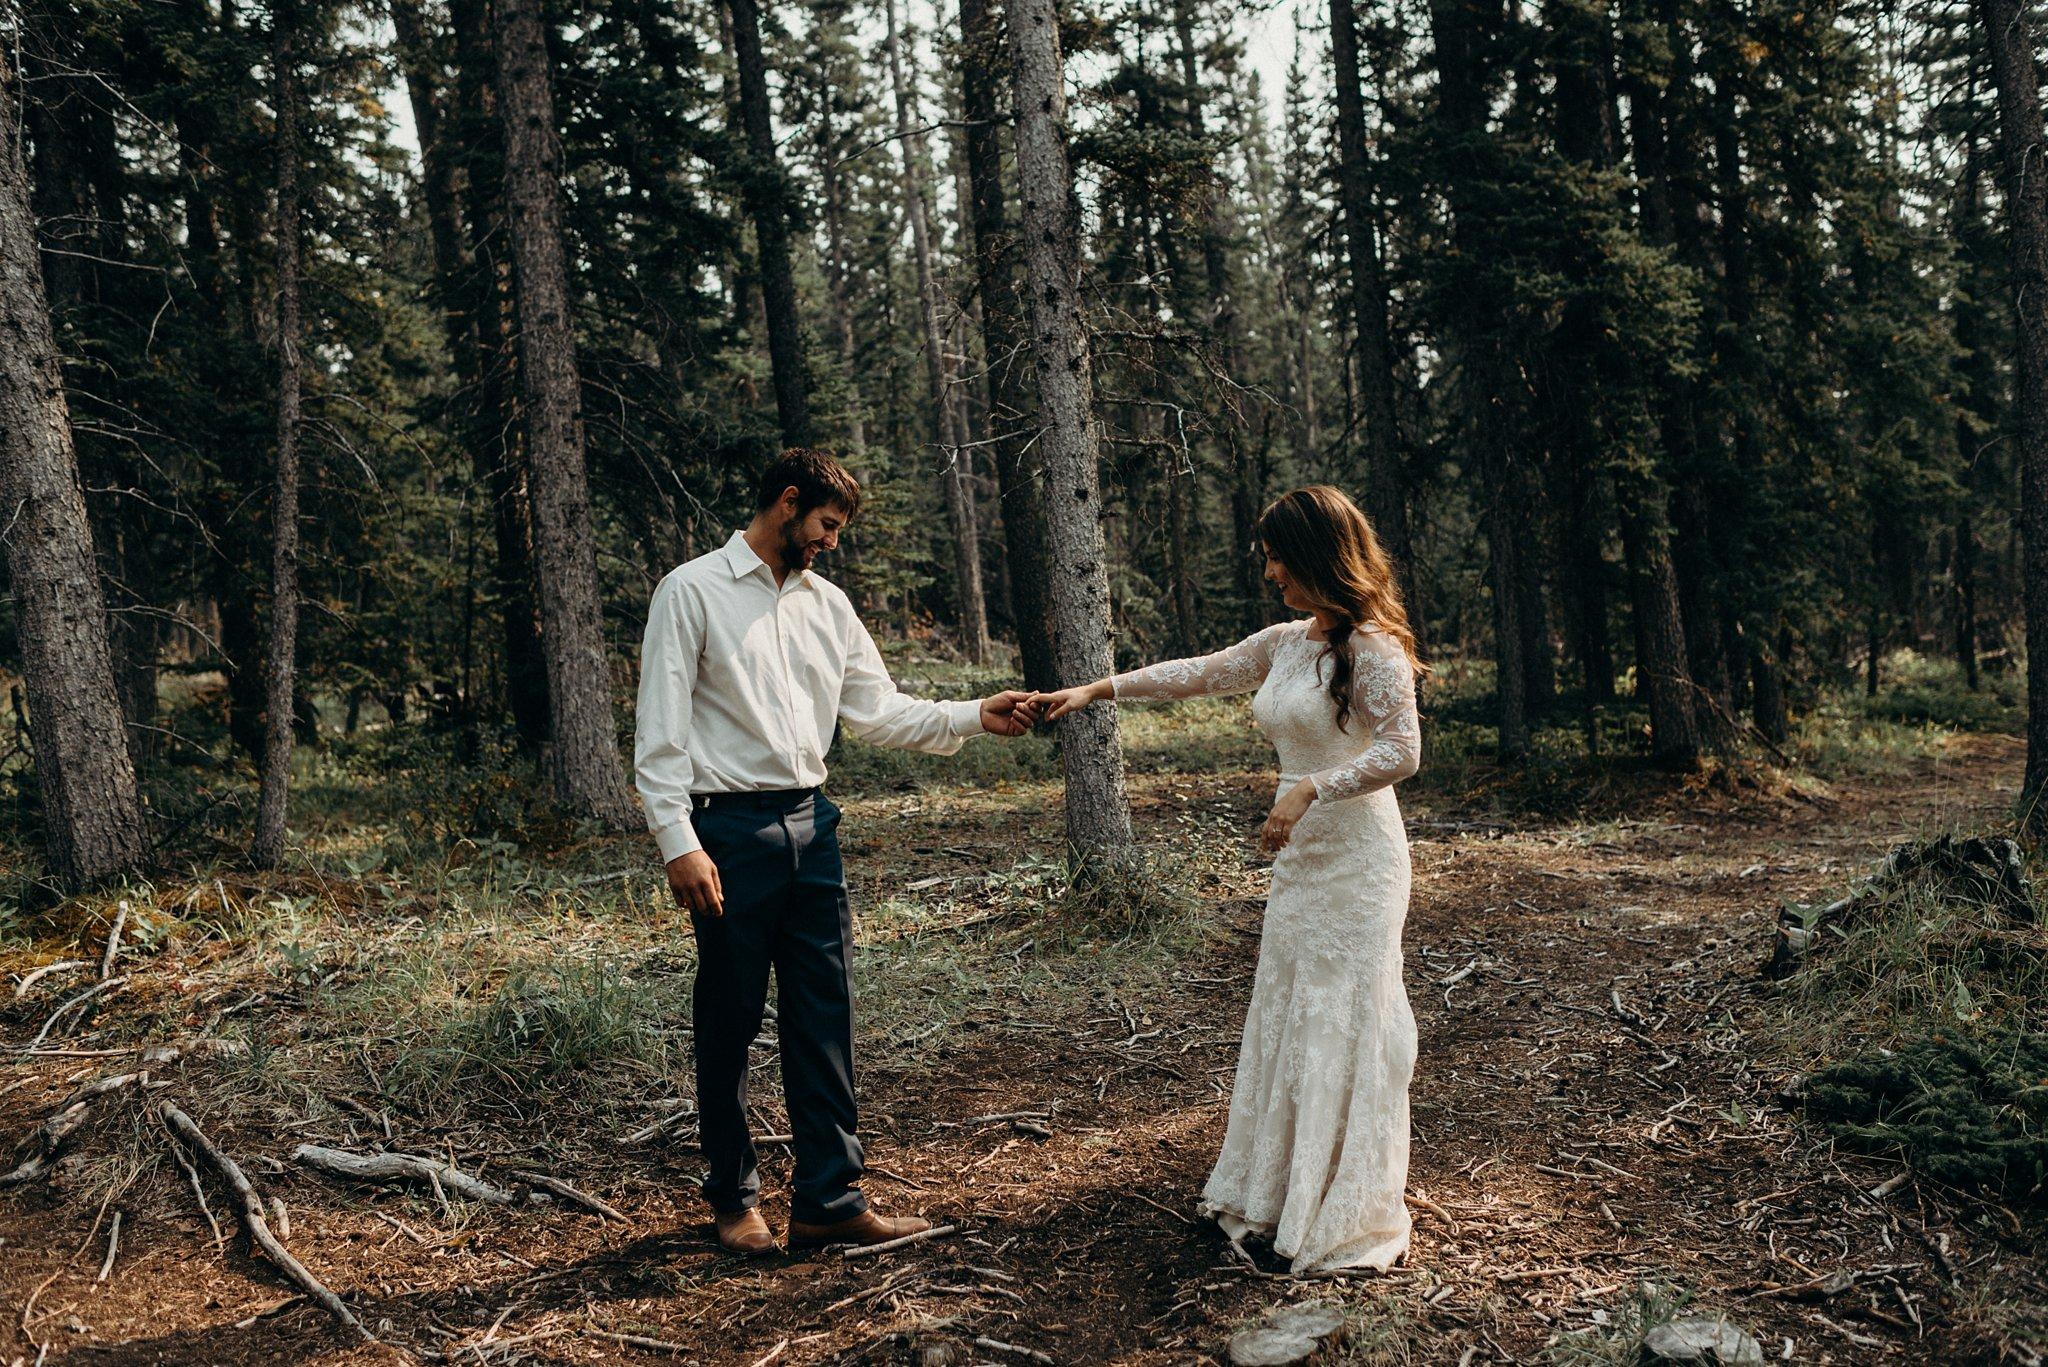 kaihla_tonai_intimate_wedding_elopement_photographer_6712.jpg